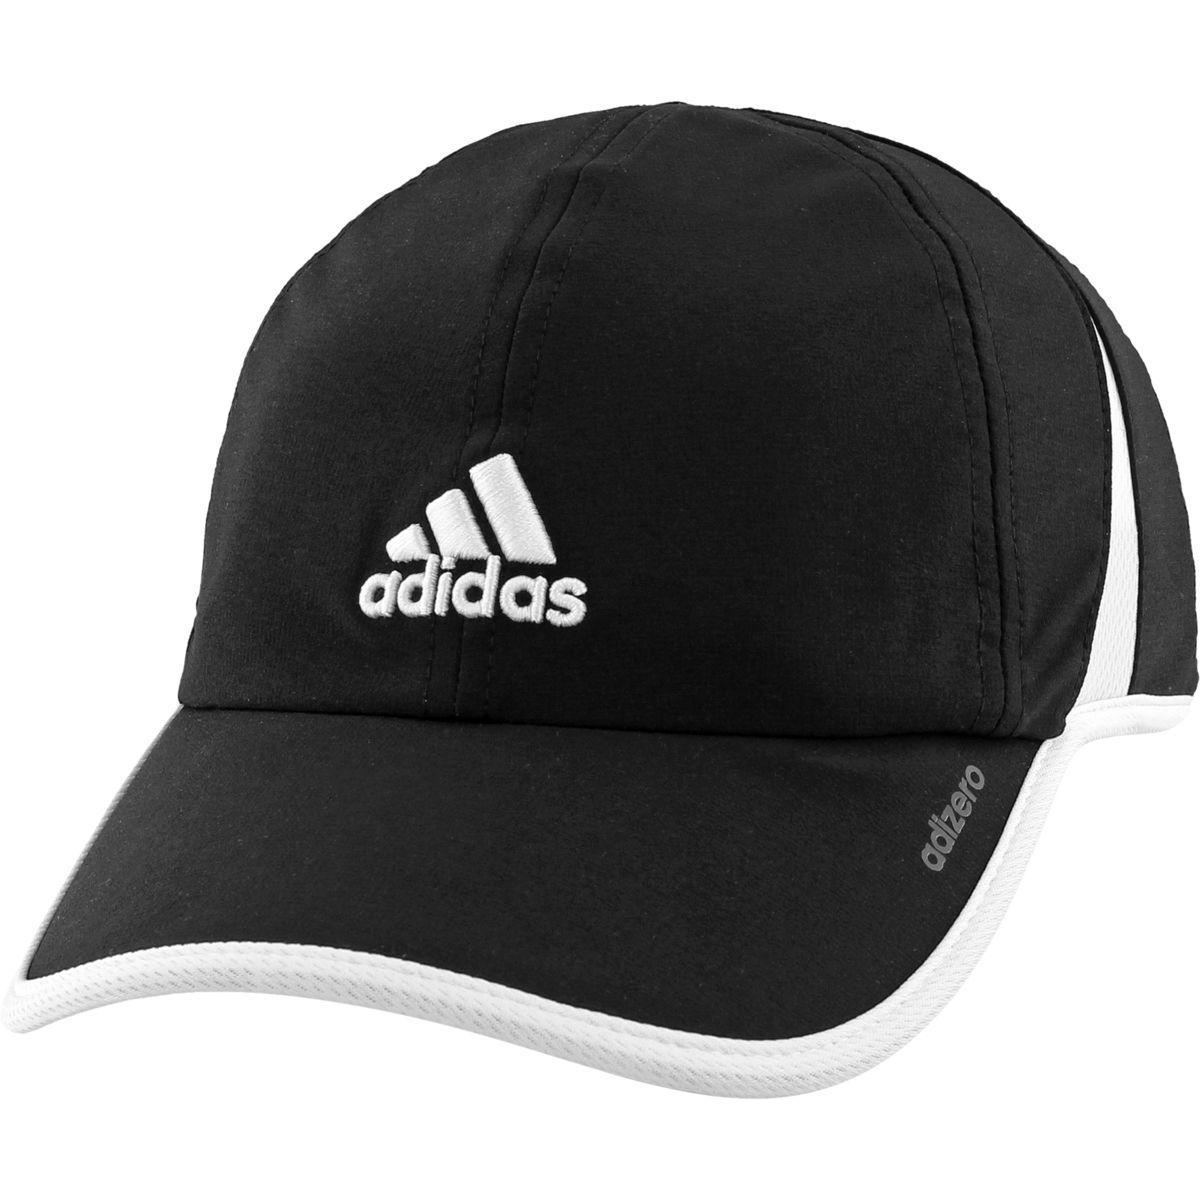 55e86e49baf6a Lyst - Adidas Originals Adizero Ii Cap in Black for Men